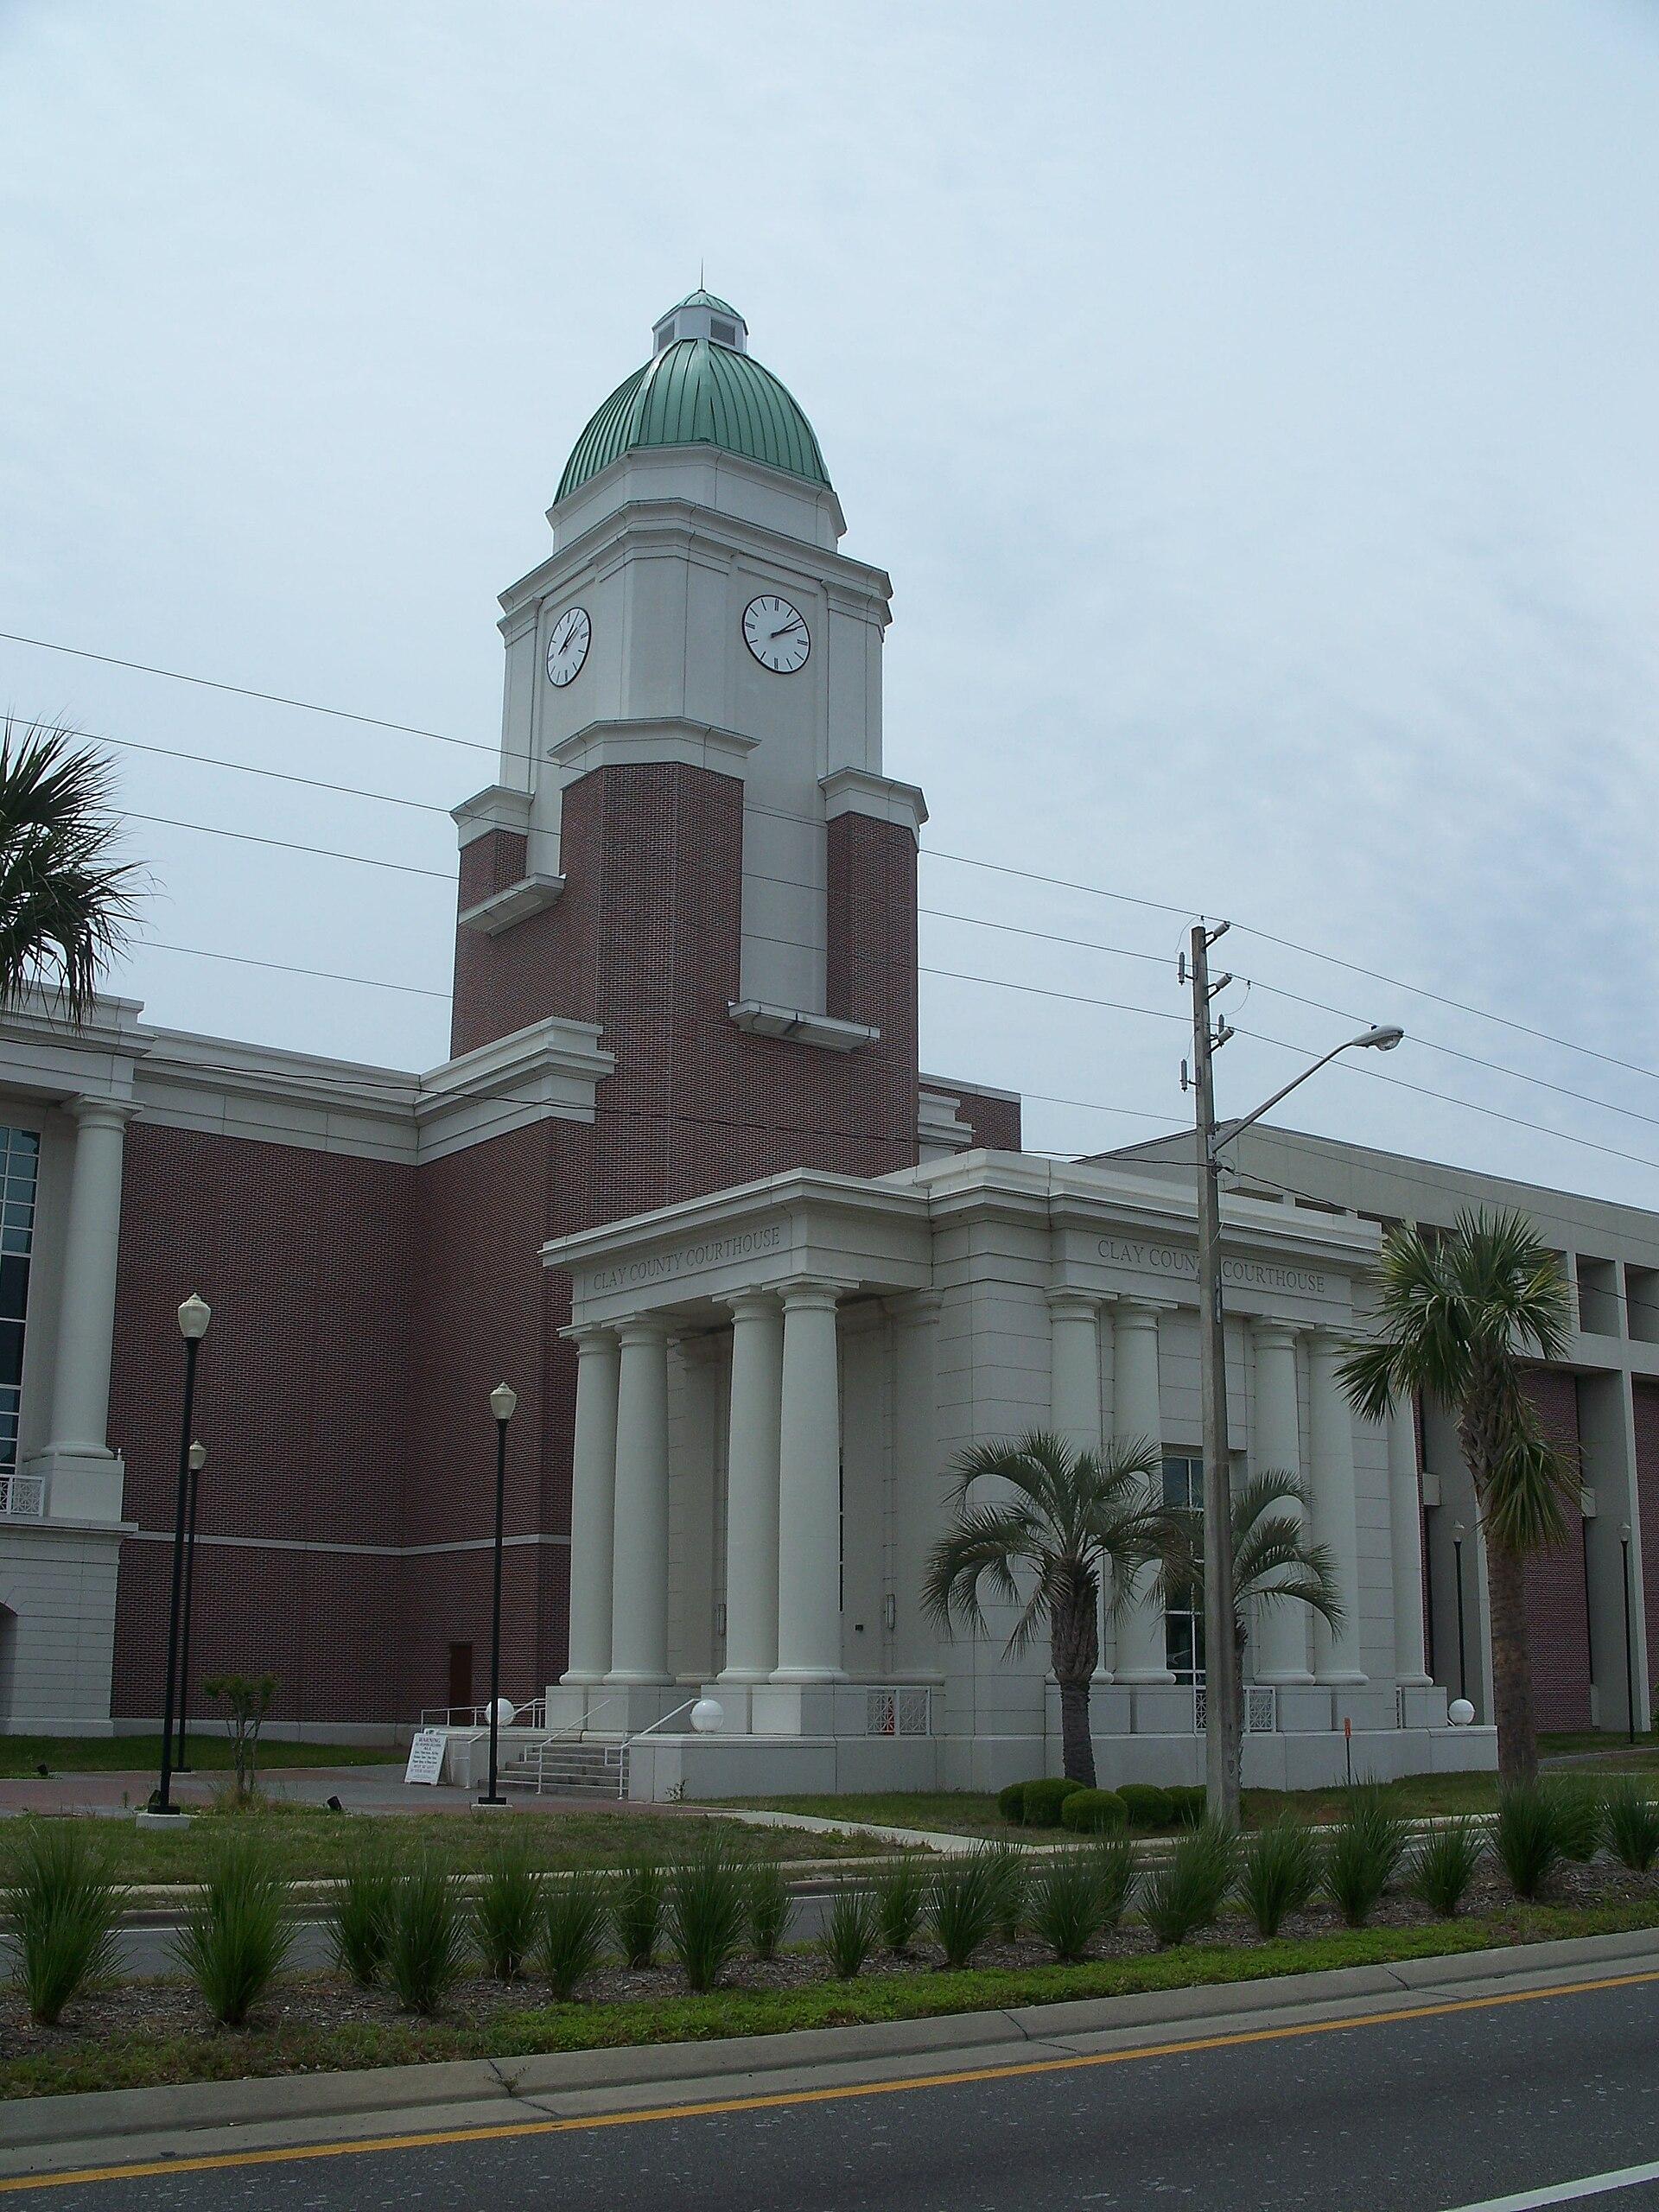 clay county florida - photo #15